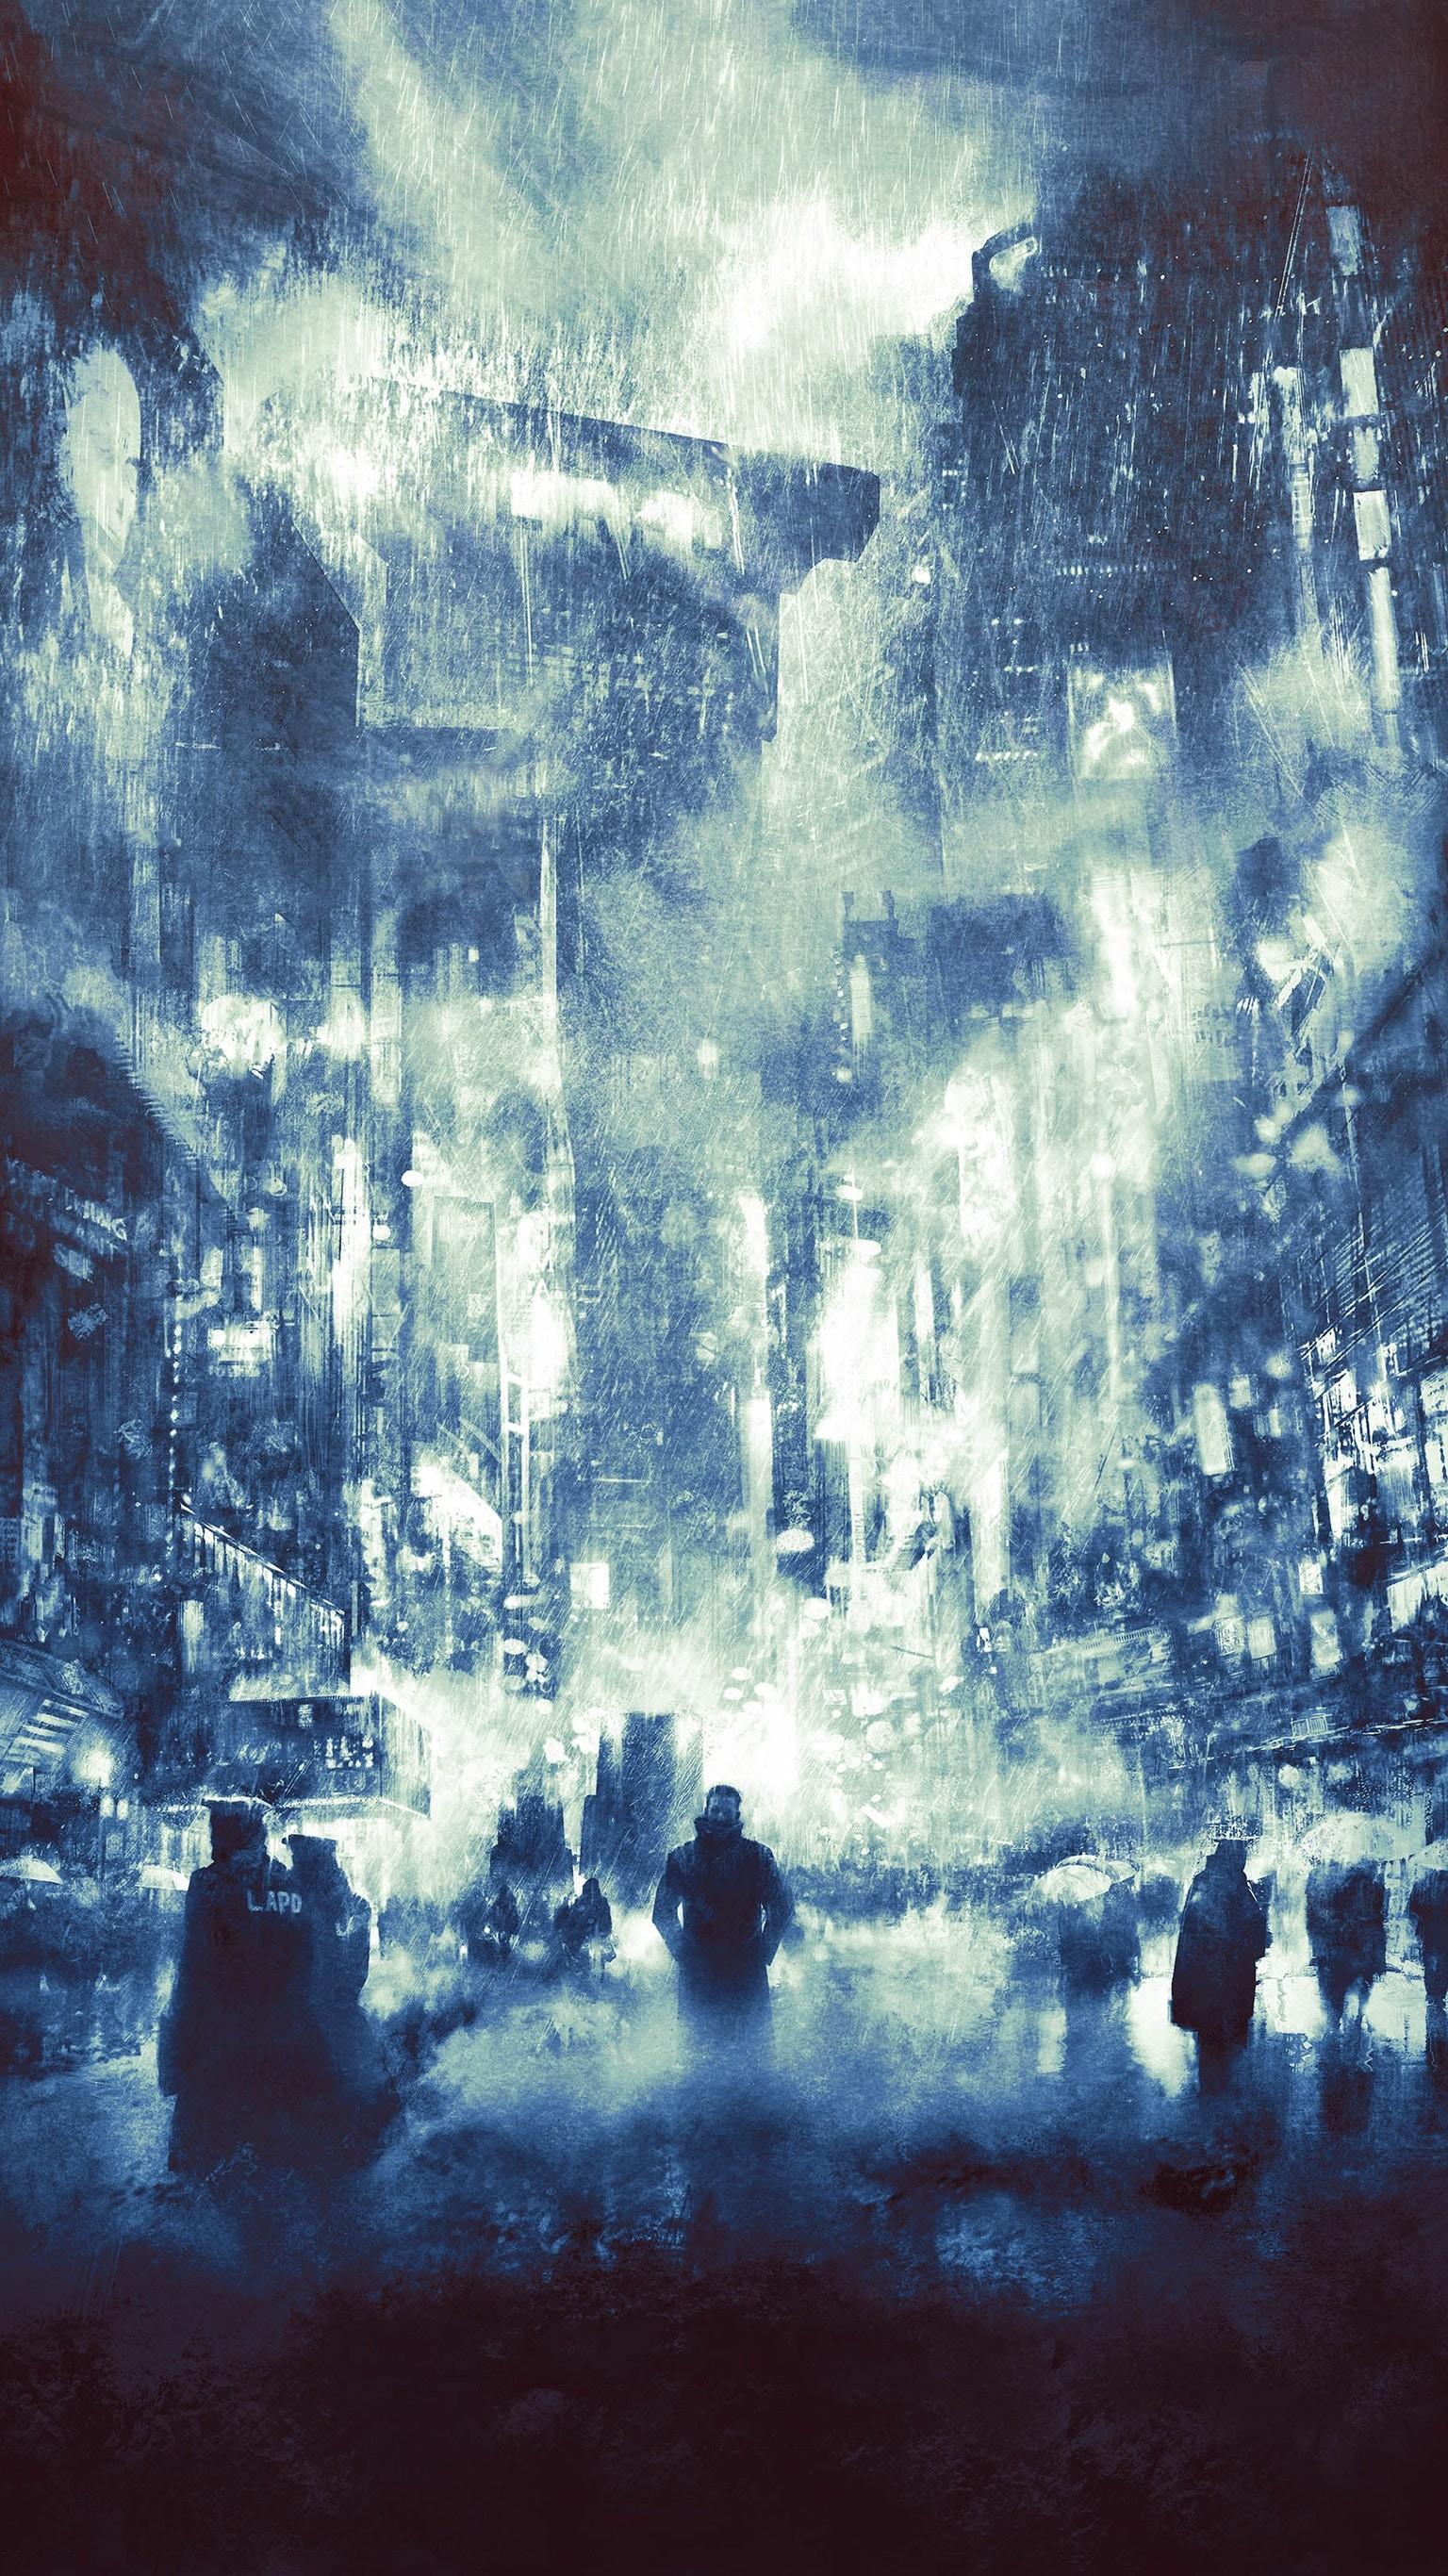 Res: 1536x2732, Image for Blade Runner Still Wallpaper Phone